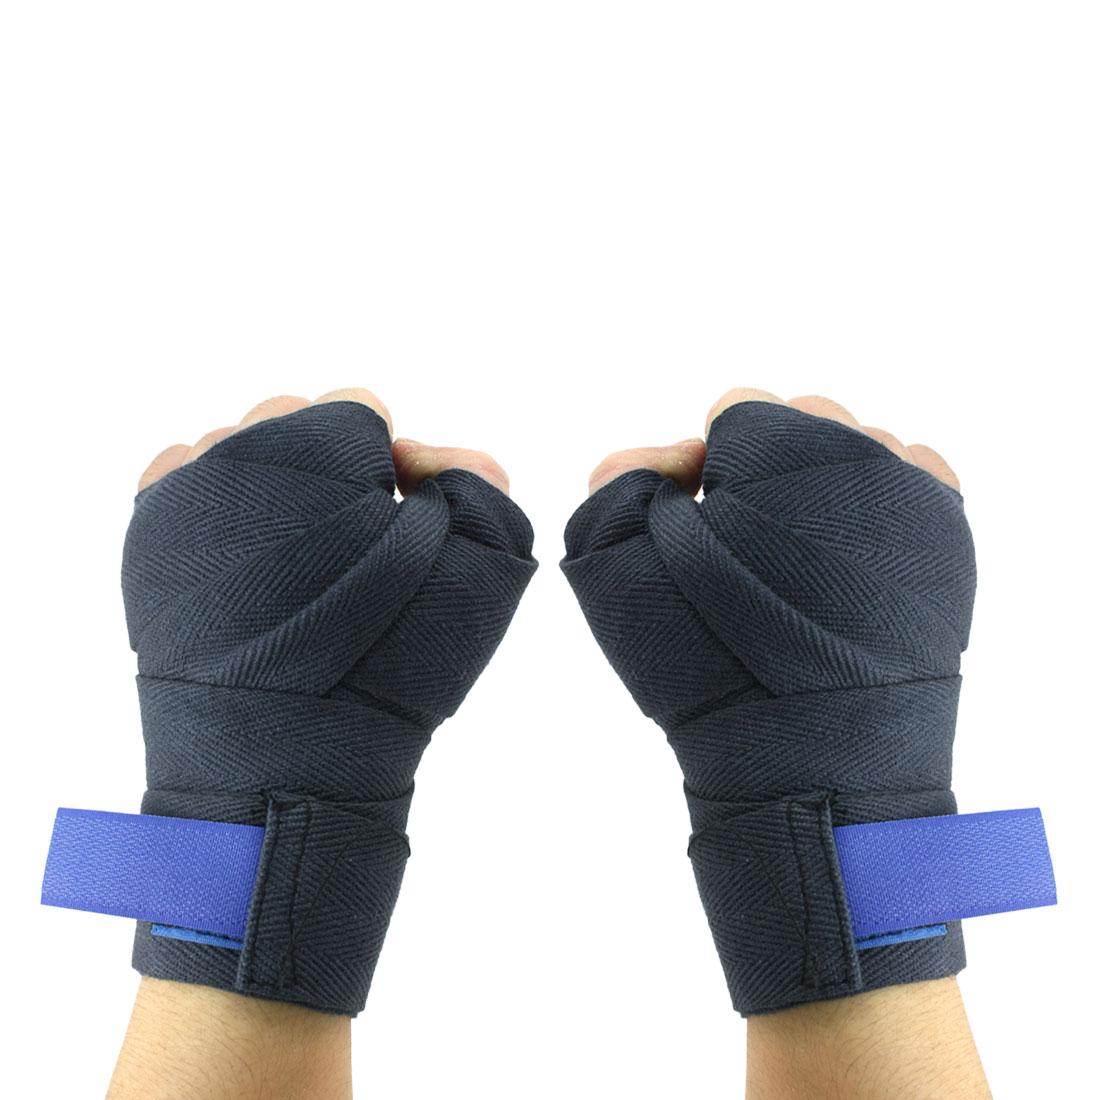 2.2M Hook Loop Closure Design Texturing Dark Blue Kickboxing Hand Wraps 2pcs